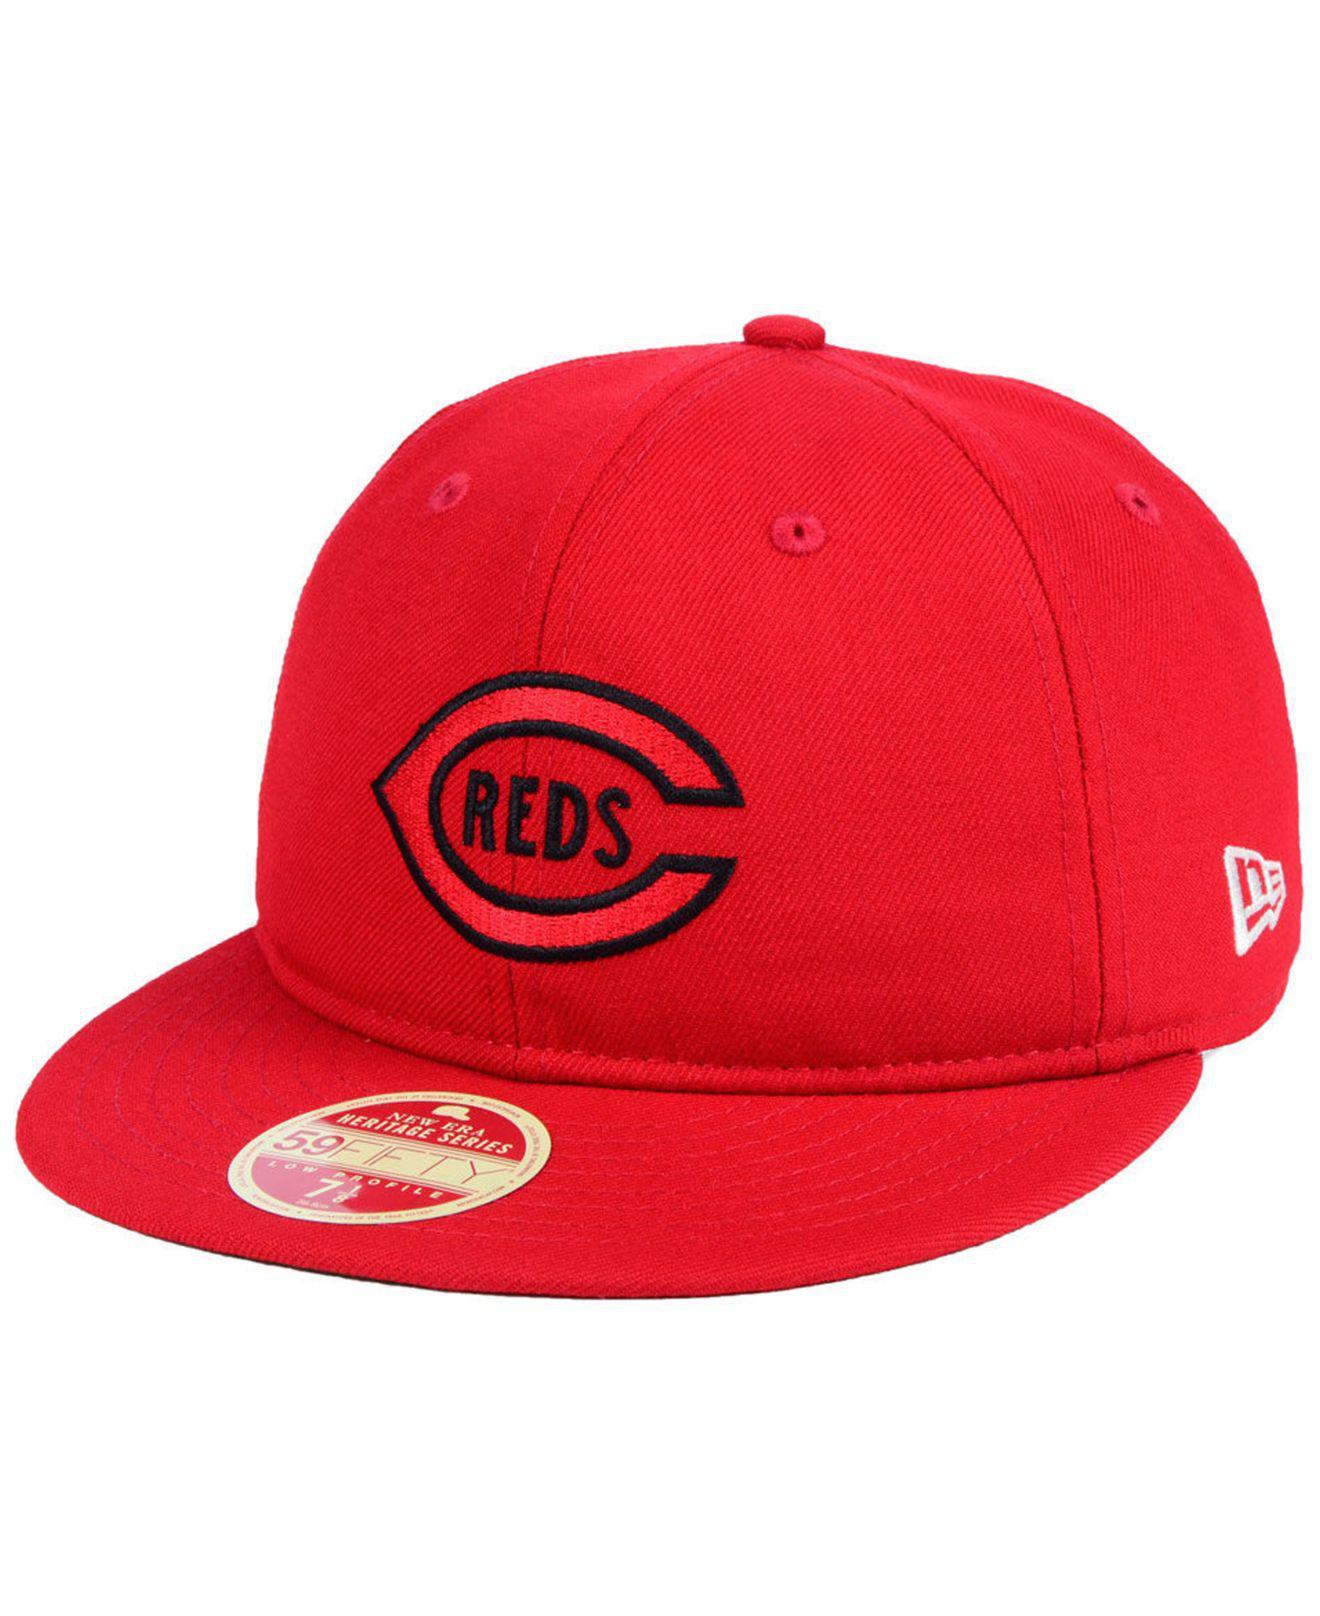 size 40 8dd74 c2670 ... australia ktz cincinnati reds heritage retro classic 59fifty fitted cap  for men lyst. view fullscreen